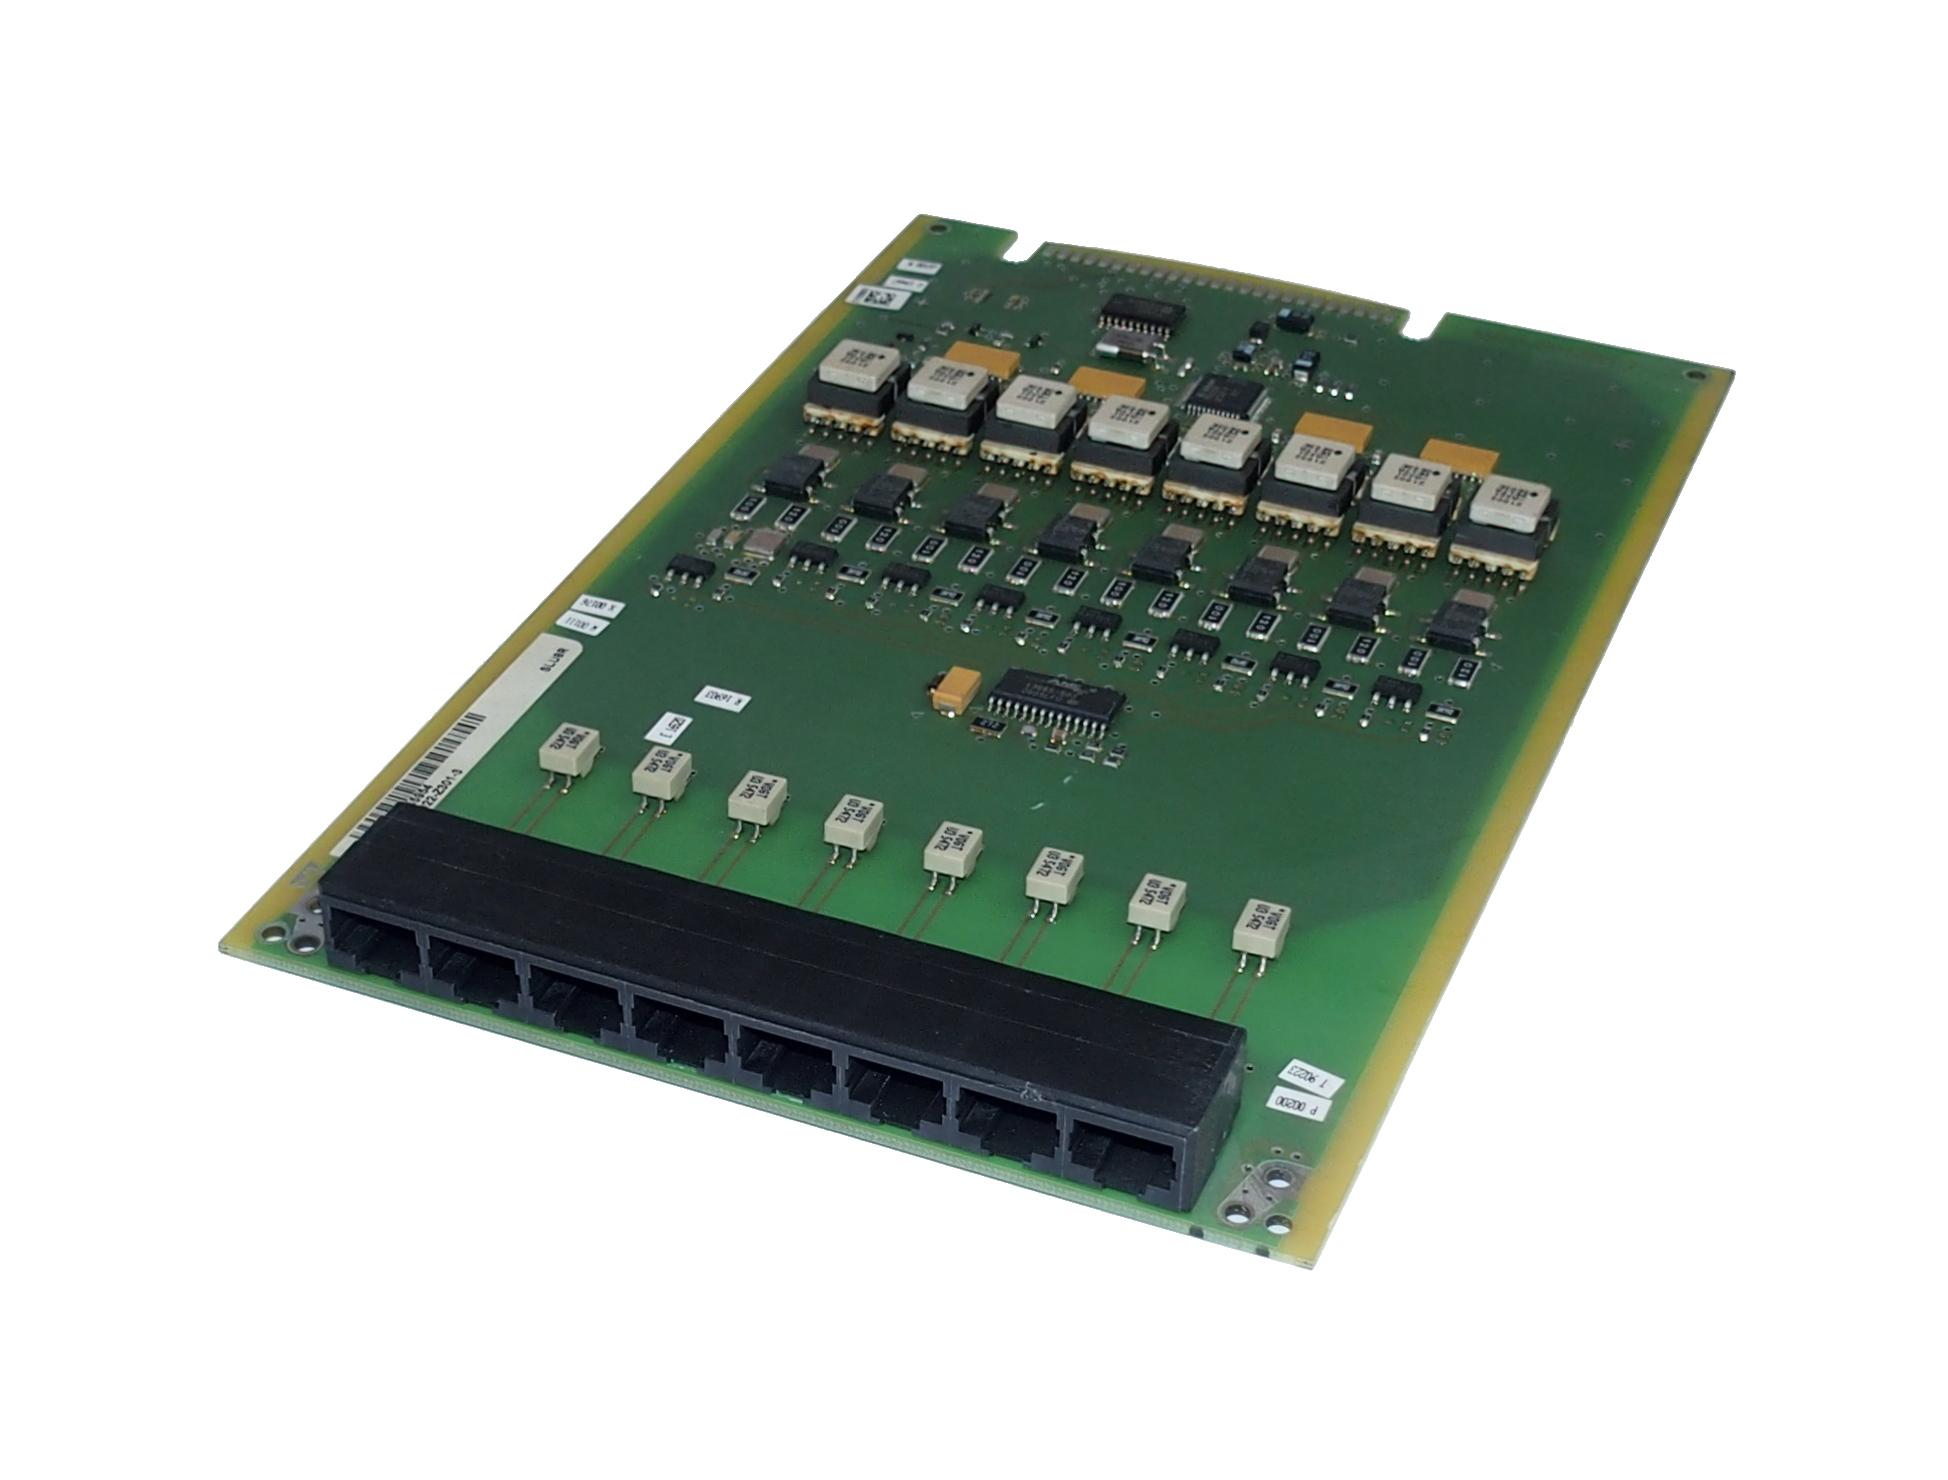 Siemens S30817-Q922-Z301-3 SLU8R Digital Subscriber Line Internal Card